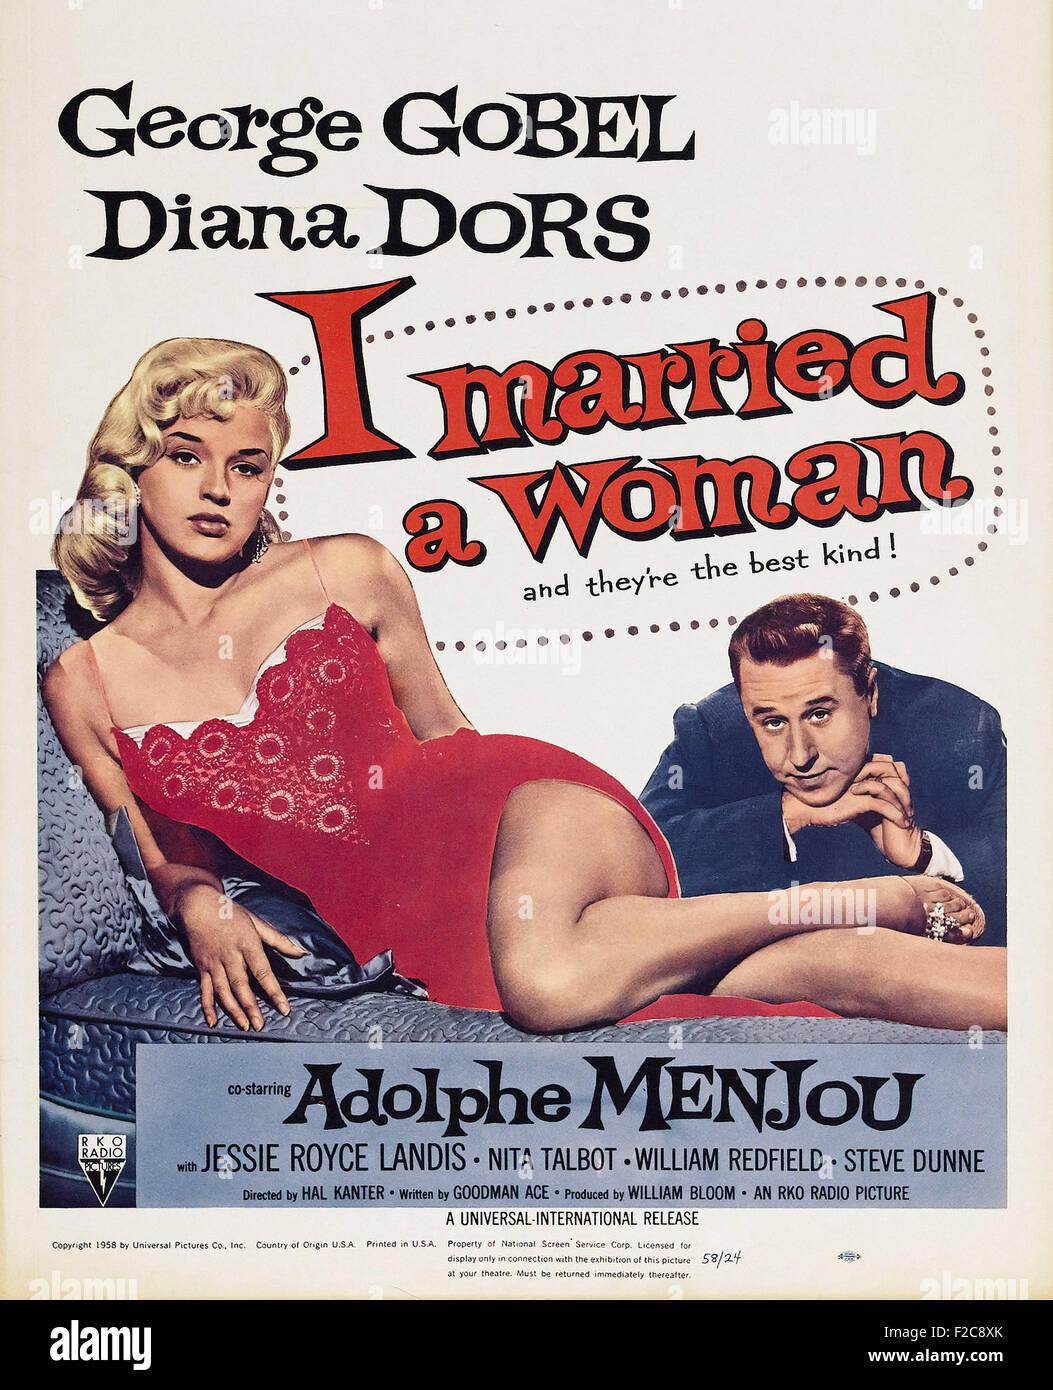 Original 1958 I Married A Woman Film Movie Poster Diana Dors US One Sheet RKO